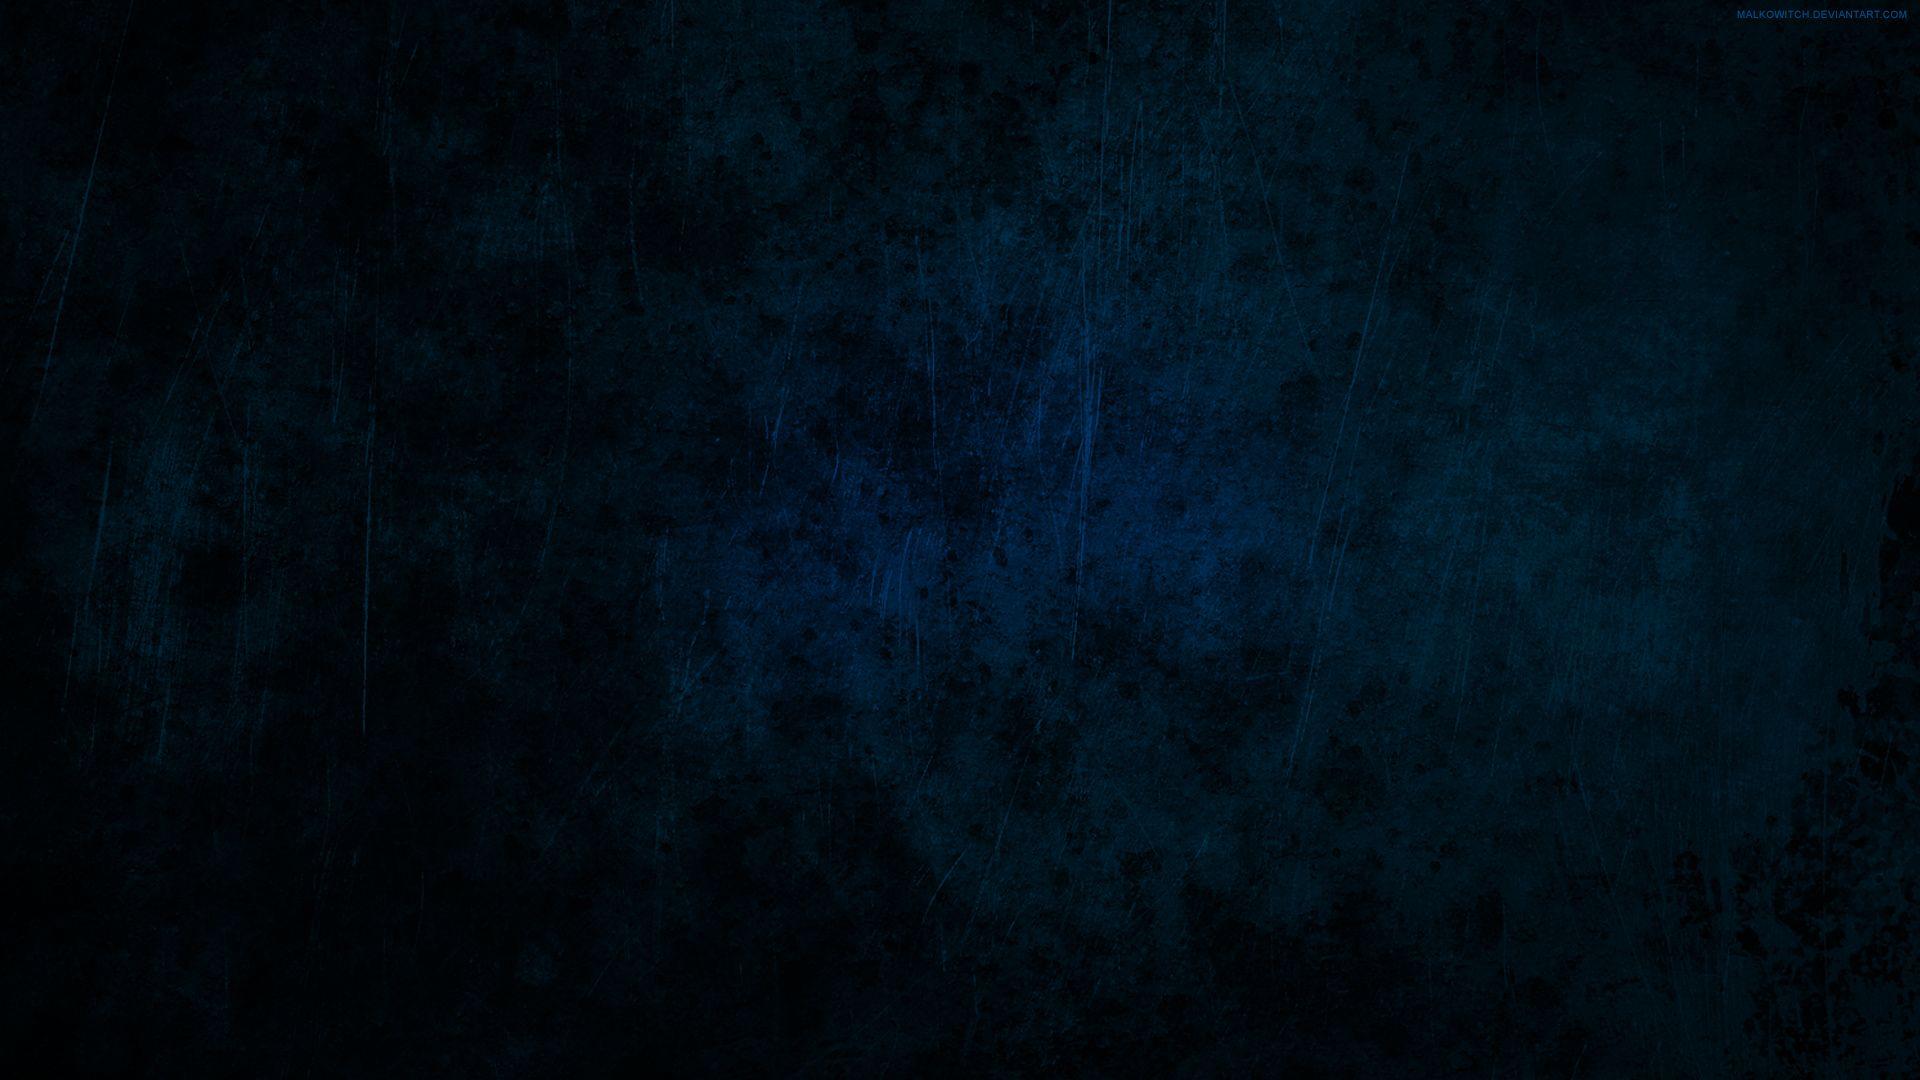 Dark Wallpaper Qhd Best Wallpaper Hd Dark Blue Wallpaper Blue Wallpapers Dark Wallpaper